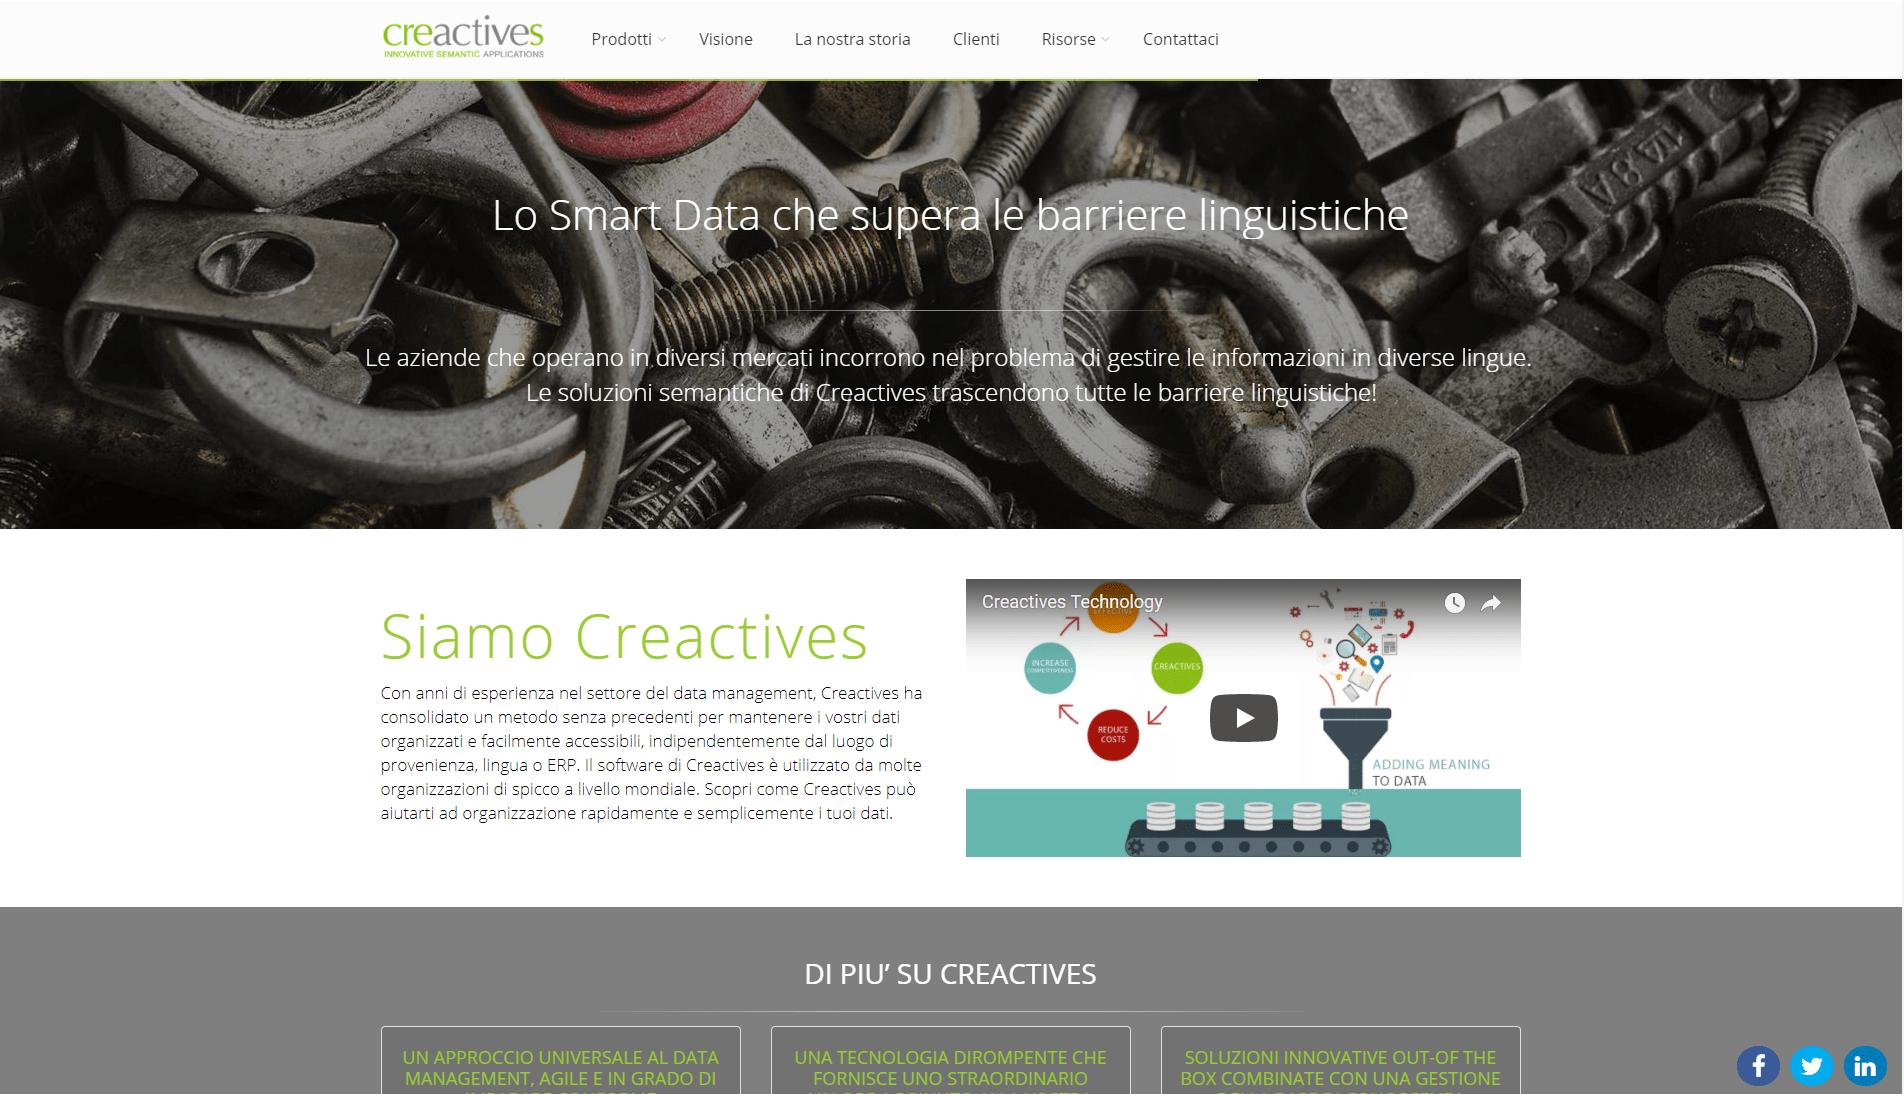 Creactives homepage